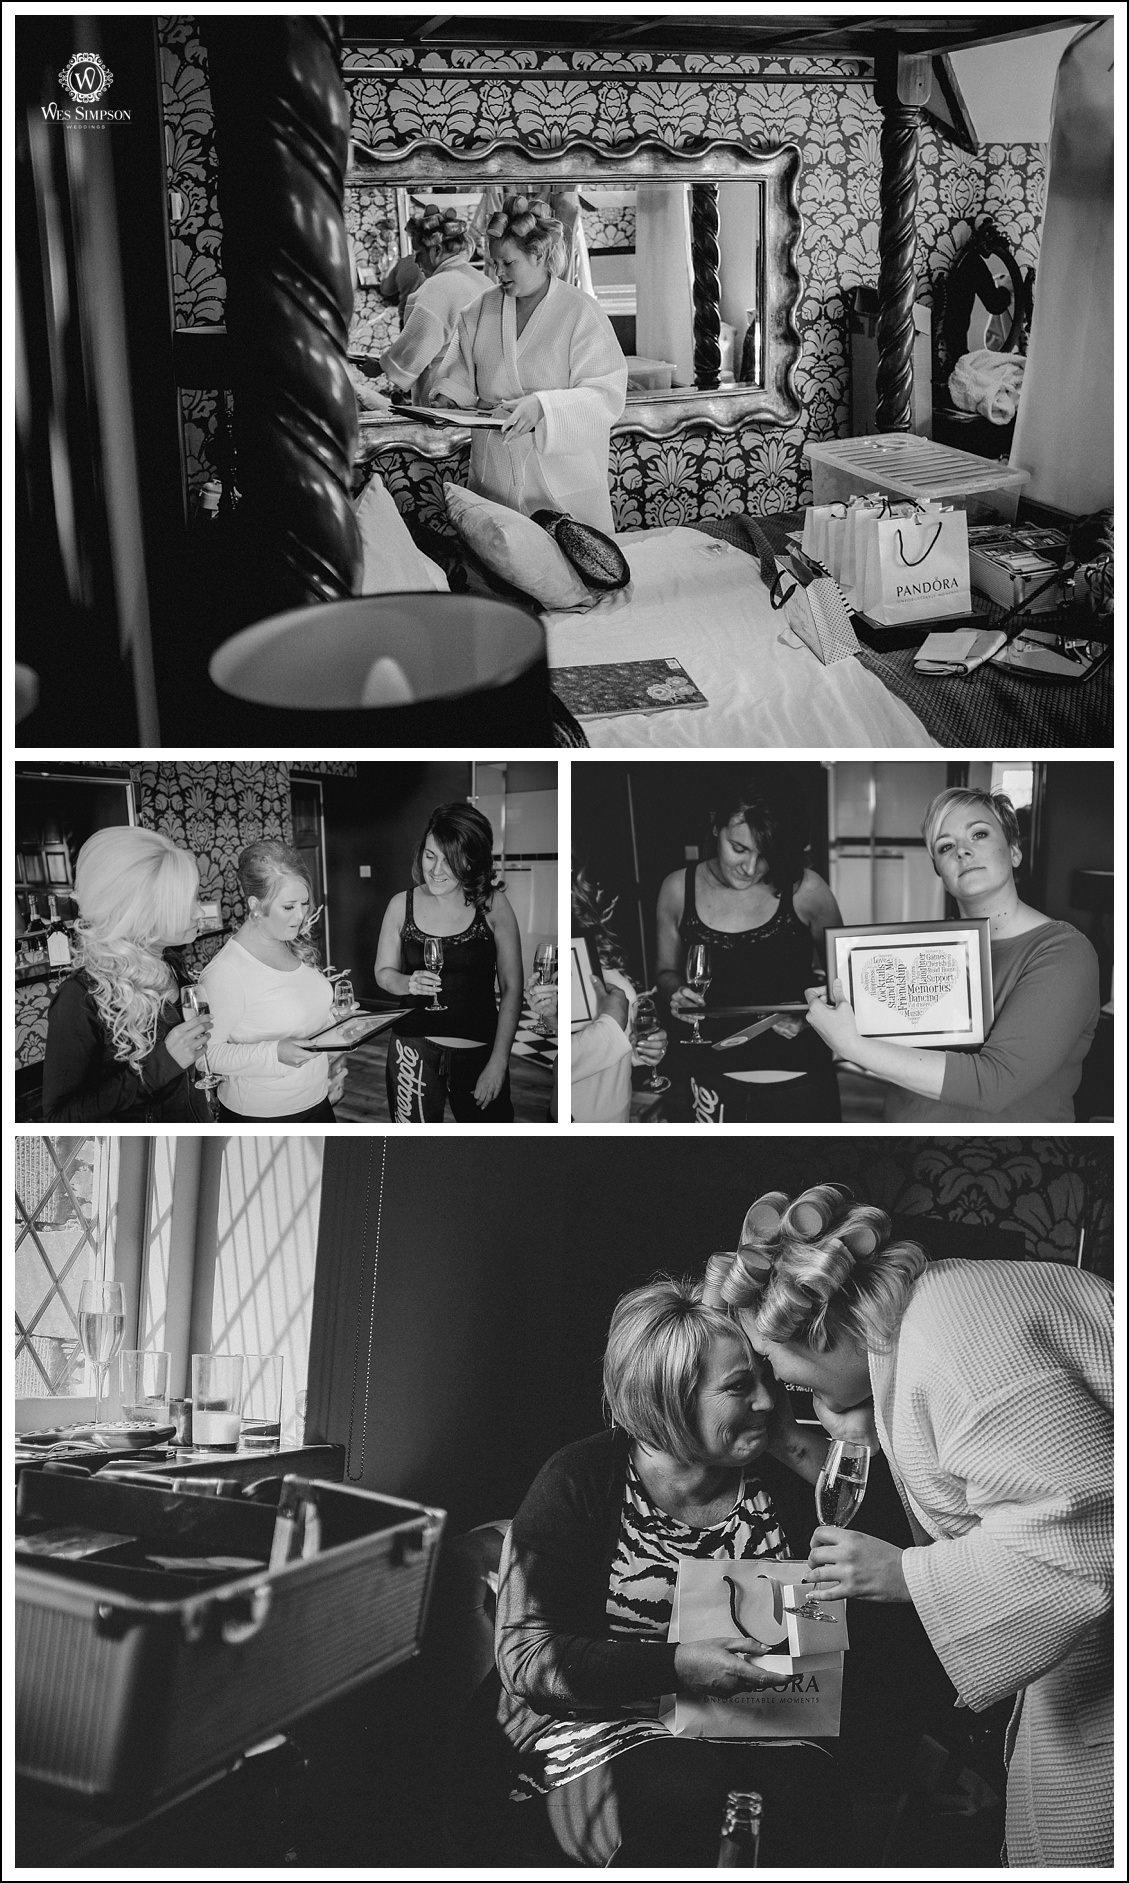 Broadoaks wedding venue, Lake District wedding photographer, Windermere, Wes Simpson photography_0005